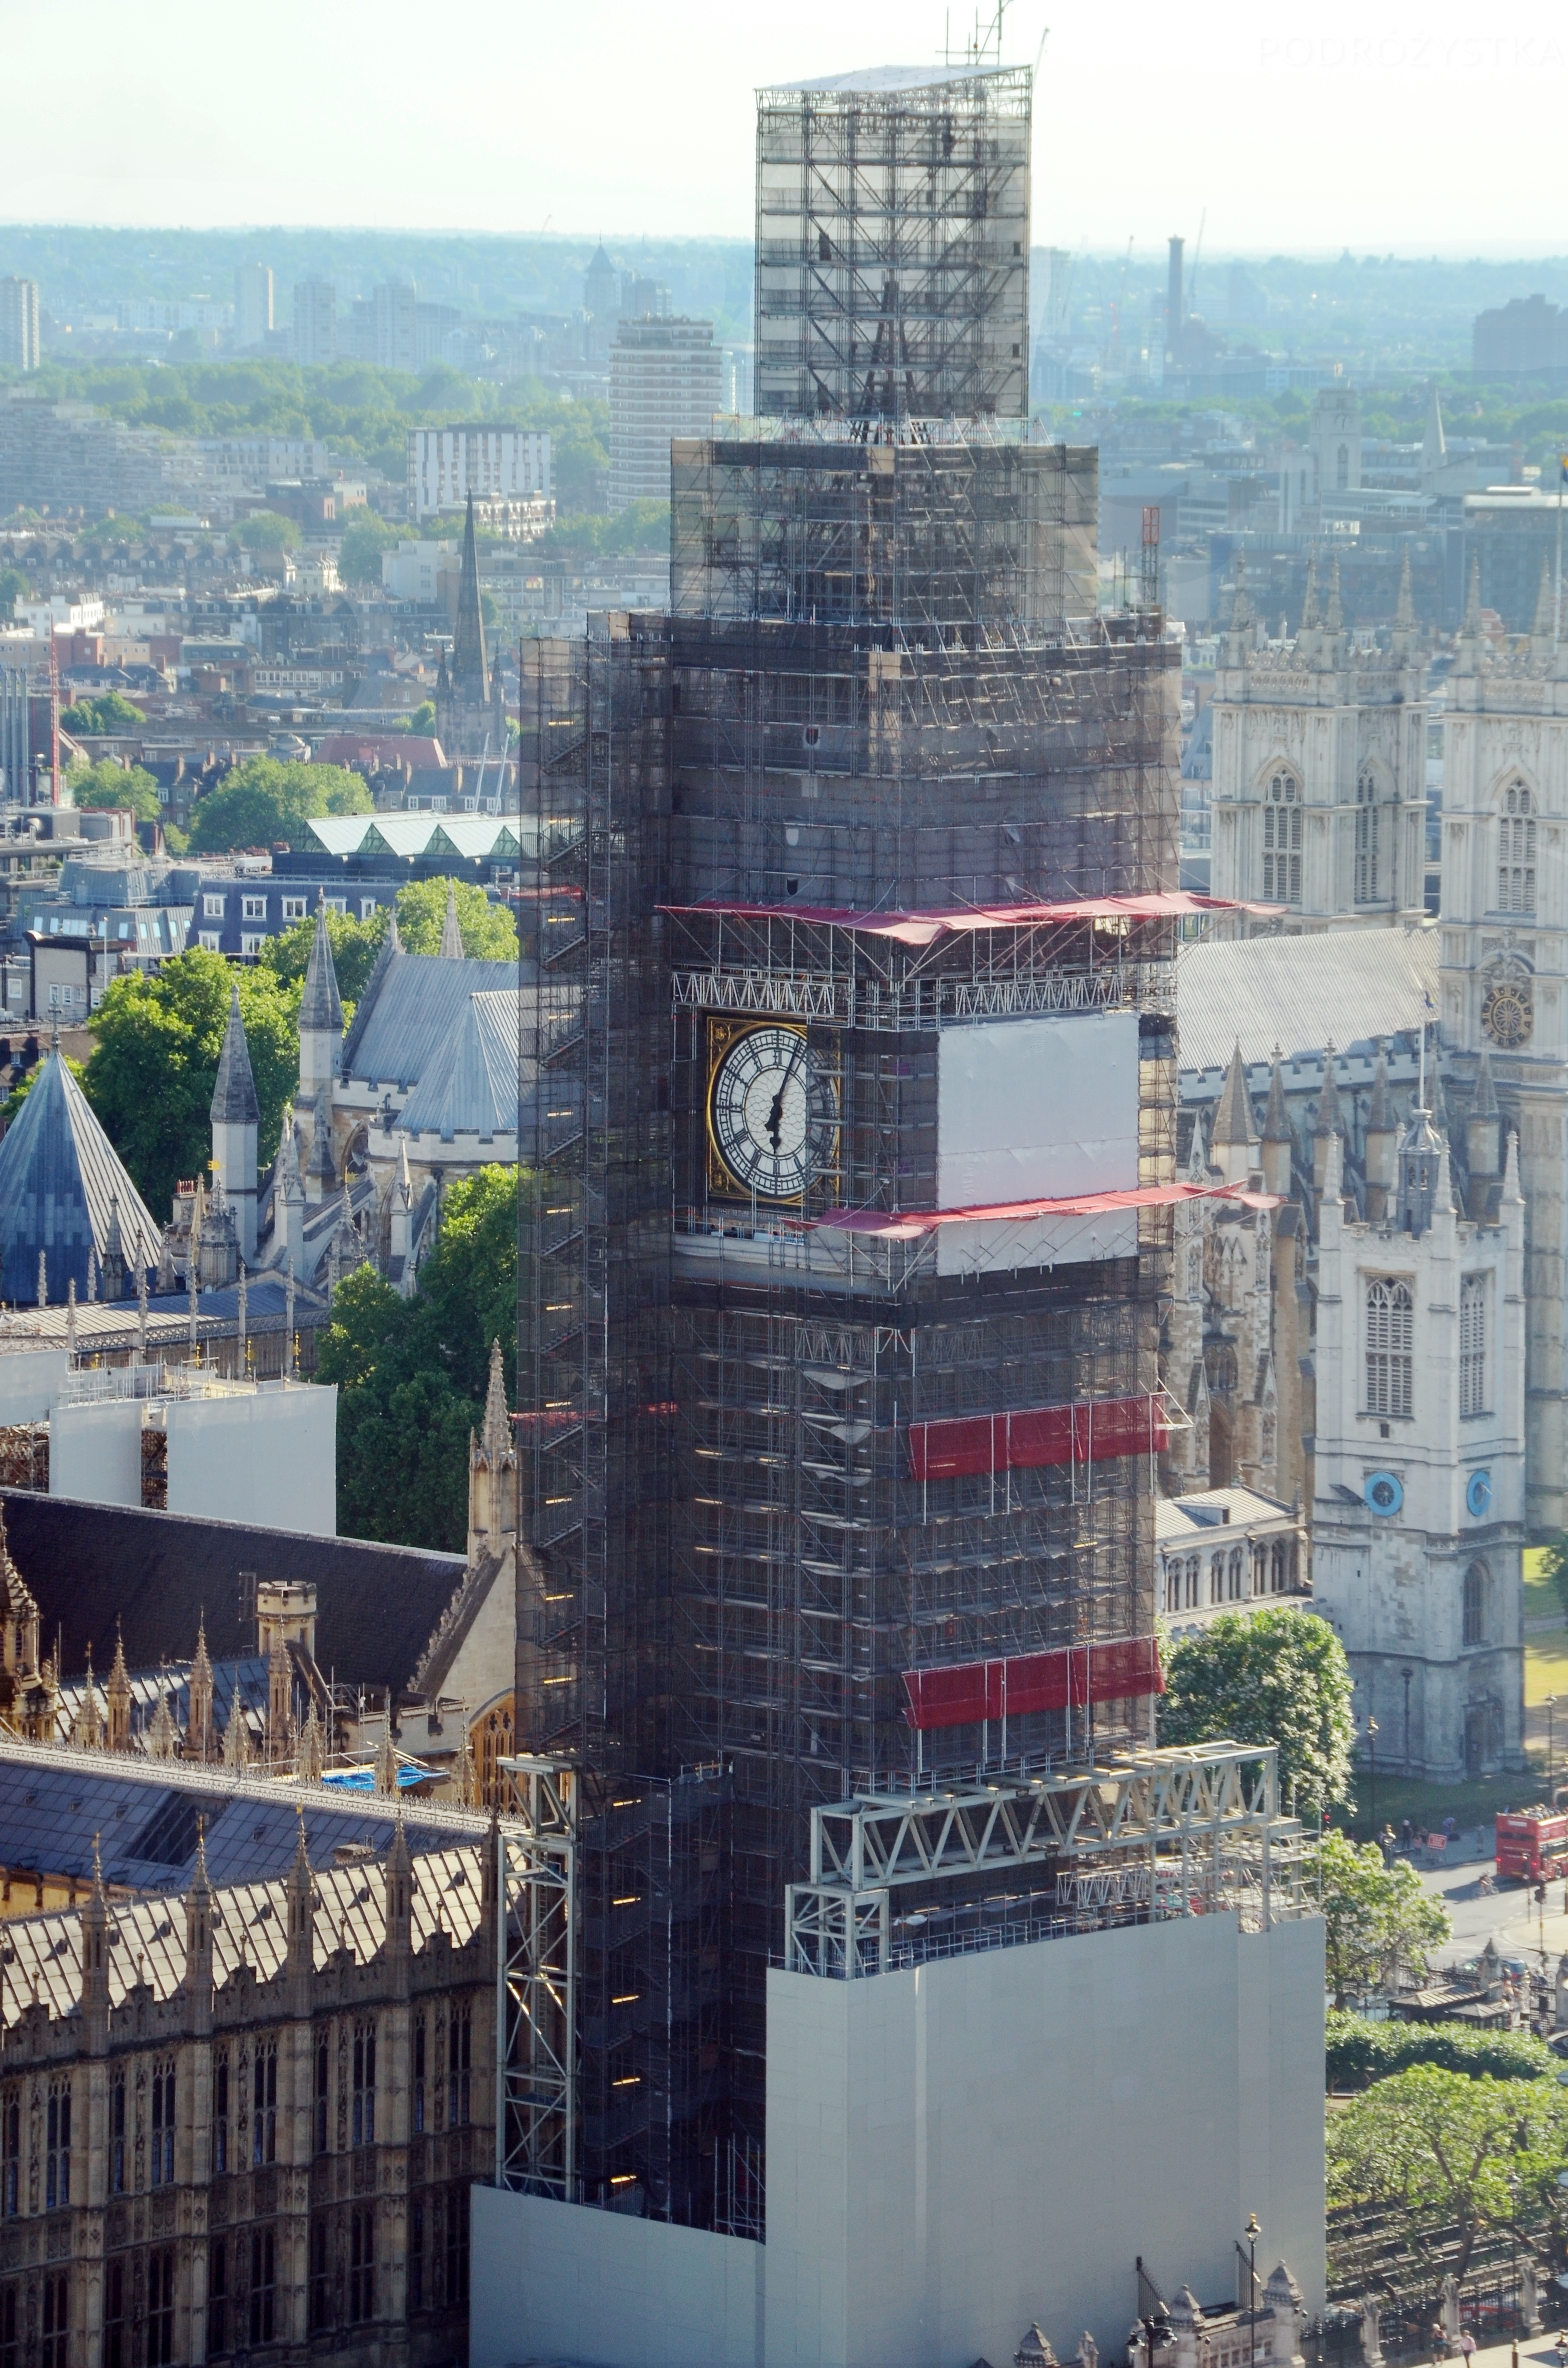 UK_III_19_London_Eye_Palace_of_Westminster_Big_Ben_(Elizabeth_Tower)_50_size_watermark